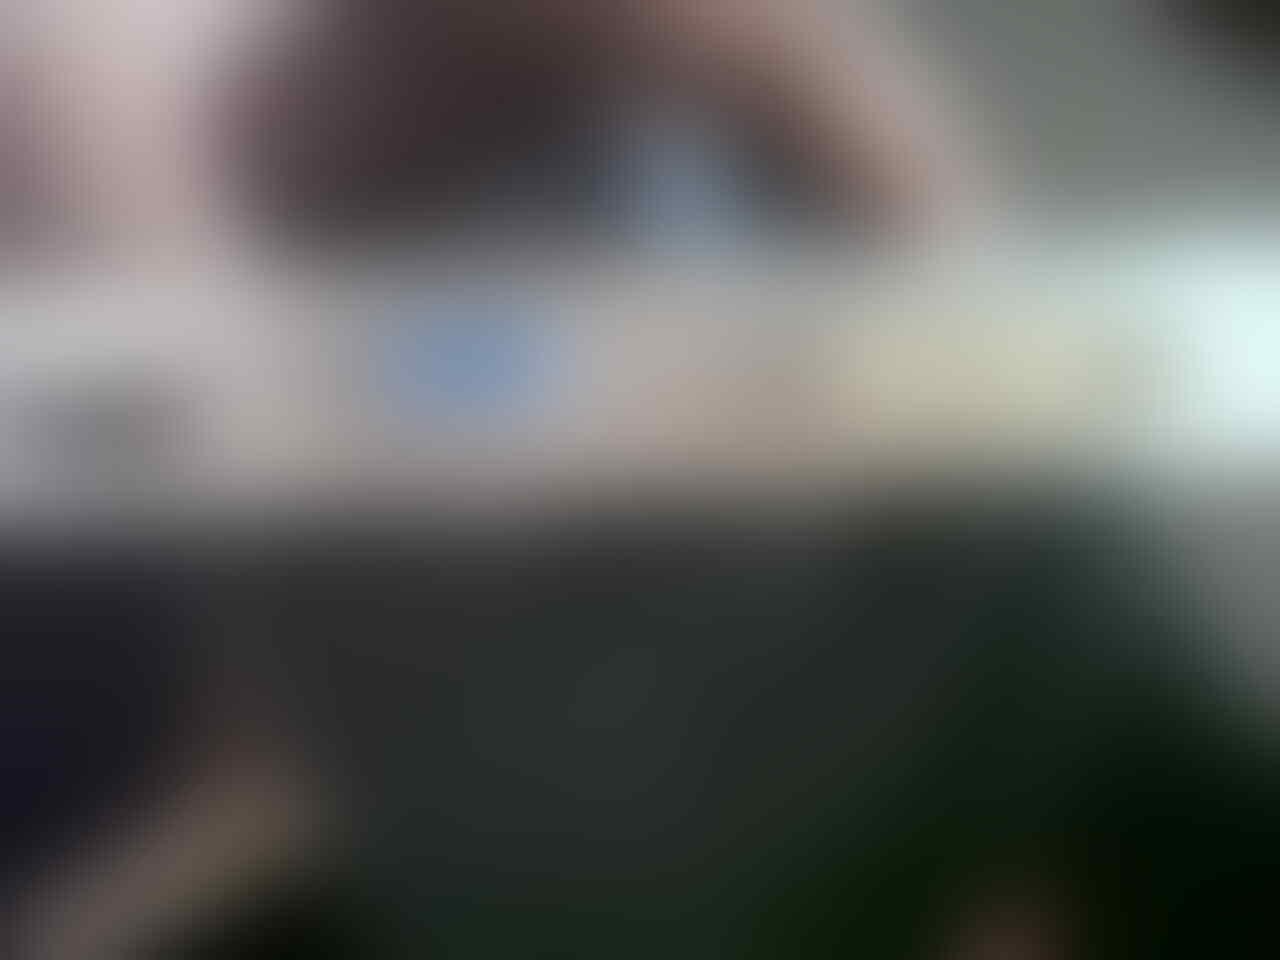 VGA PixelView Nvidia Geforce 9400 GT 1GB 128bit